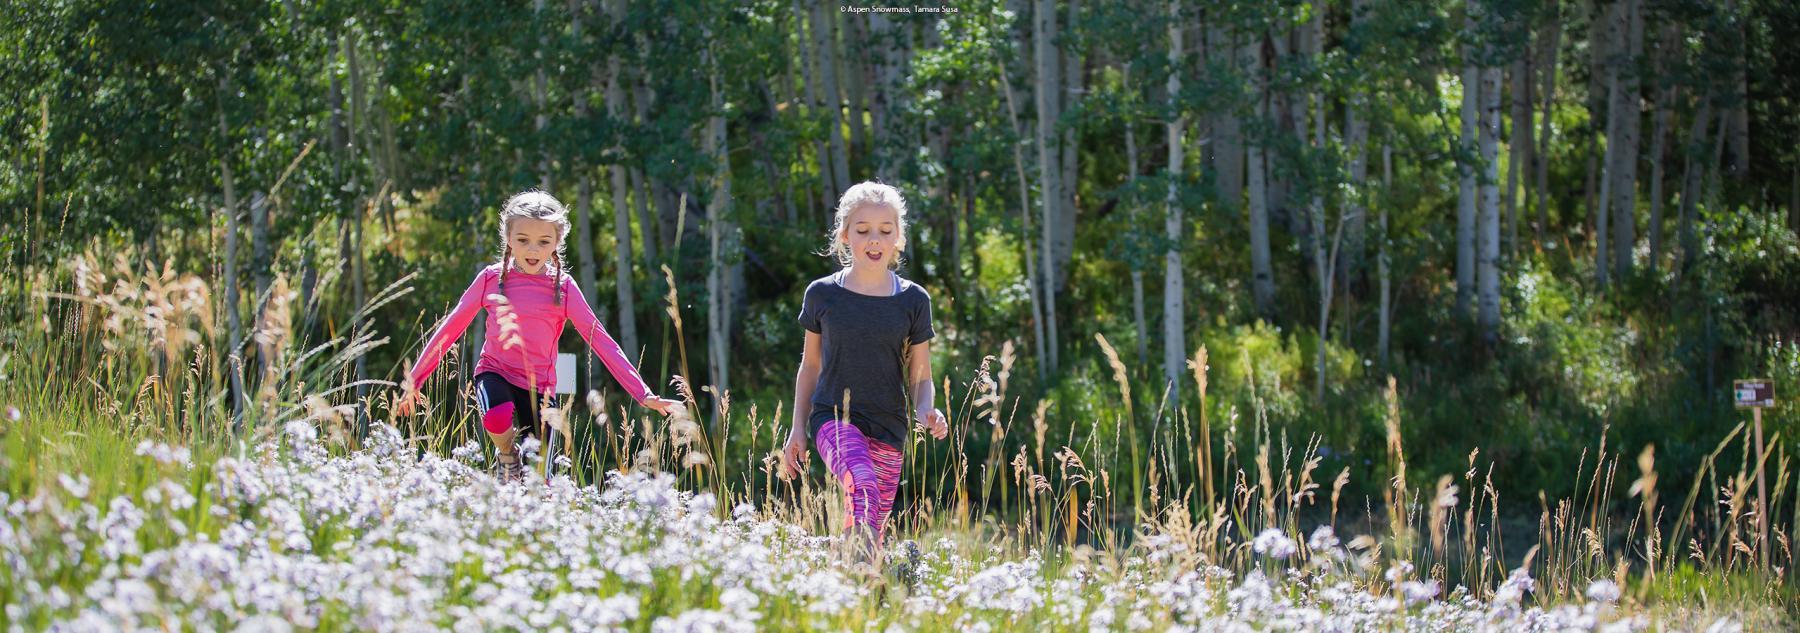 Aspen Kids Enjoying Summer